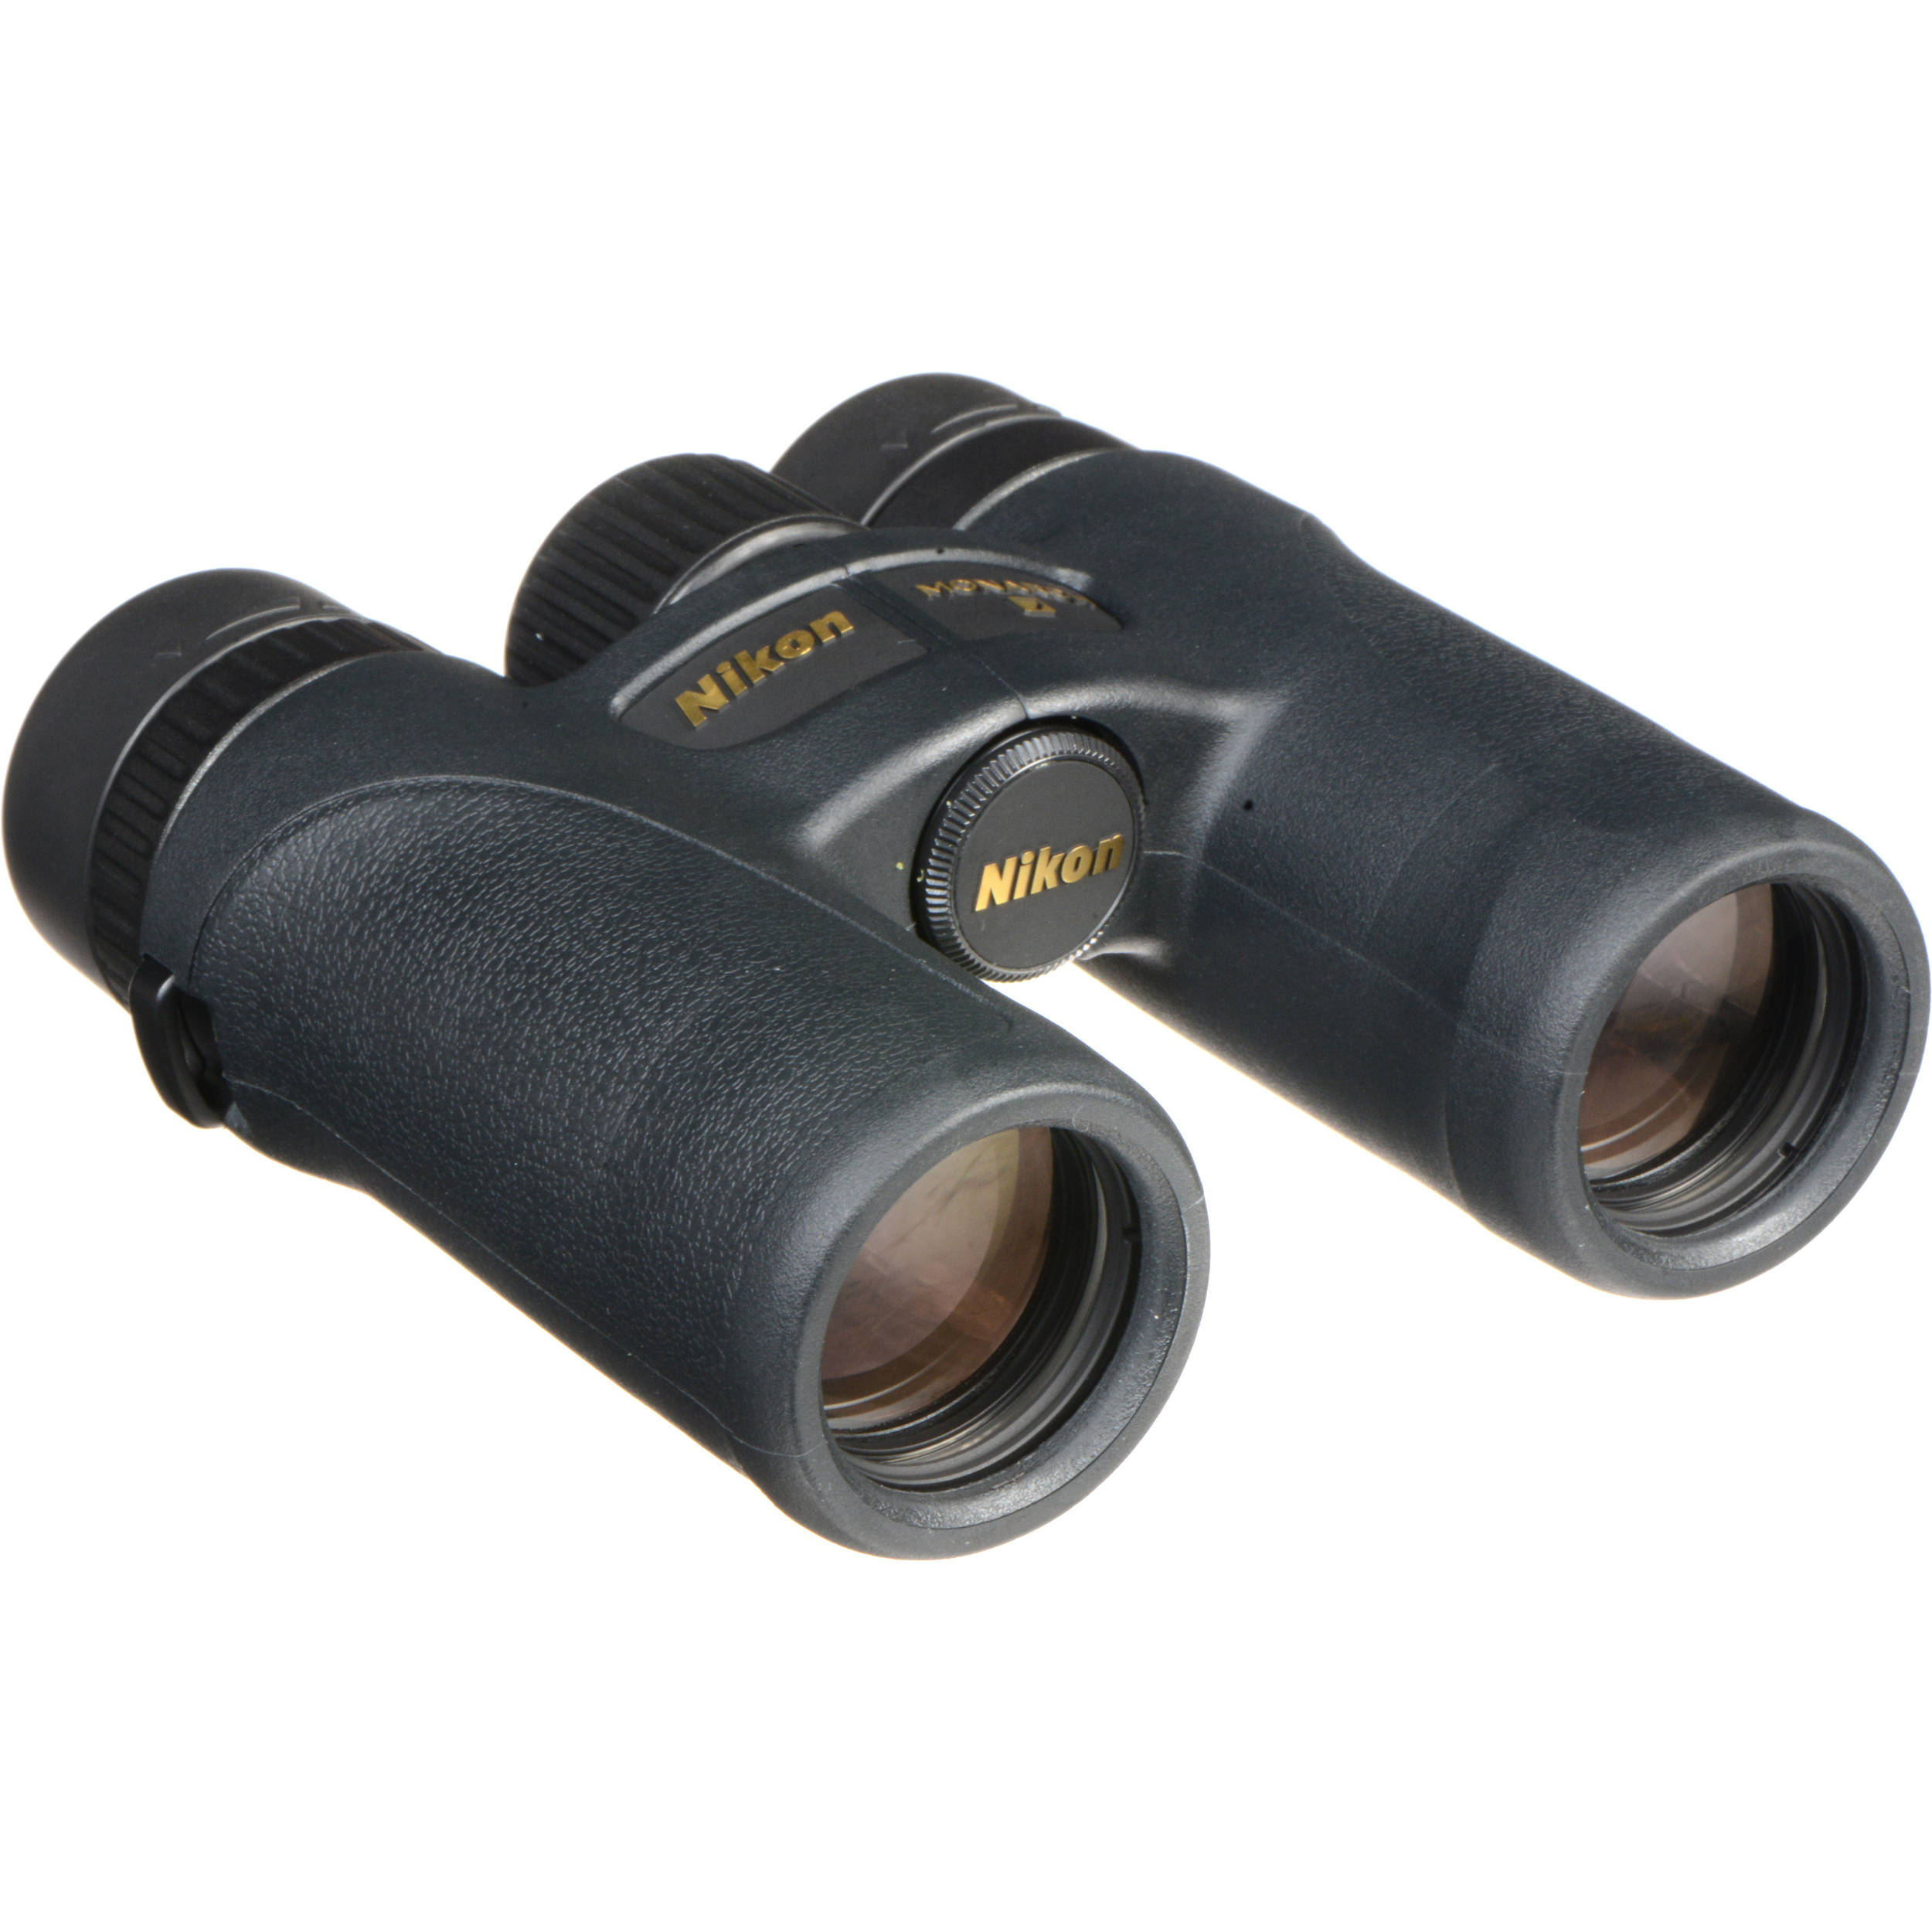 Nikon 8x30 Monarch 7 ATB Binoculars (Black) 7579 B&H Photo Video